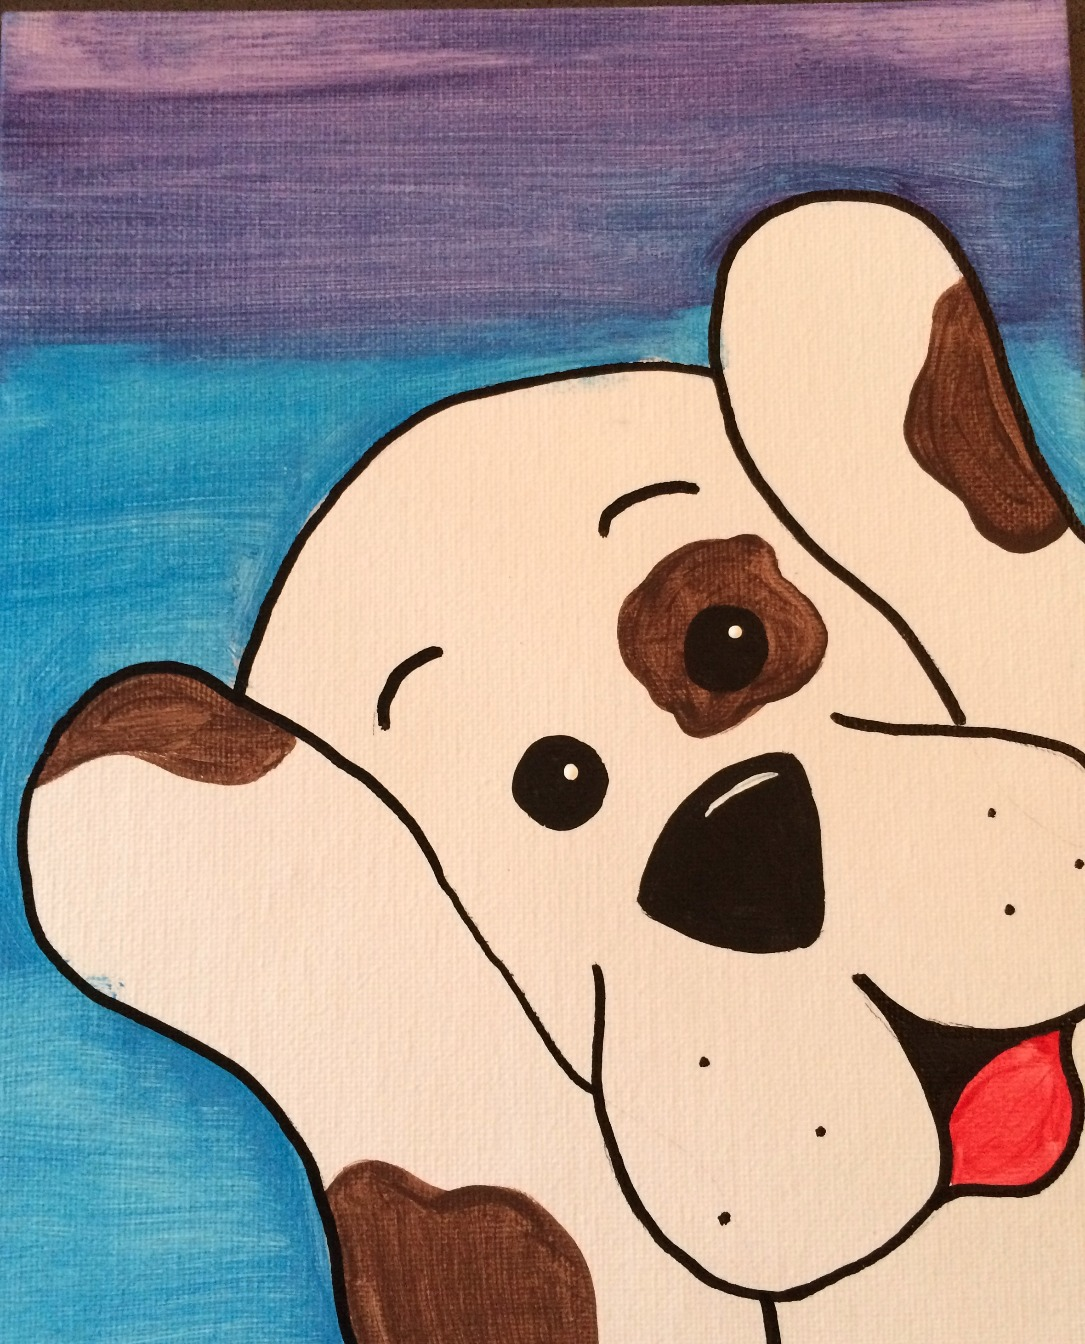 Peekin' Pup